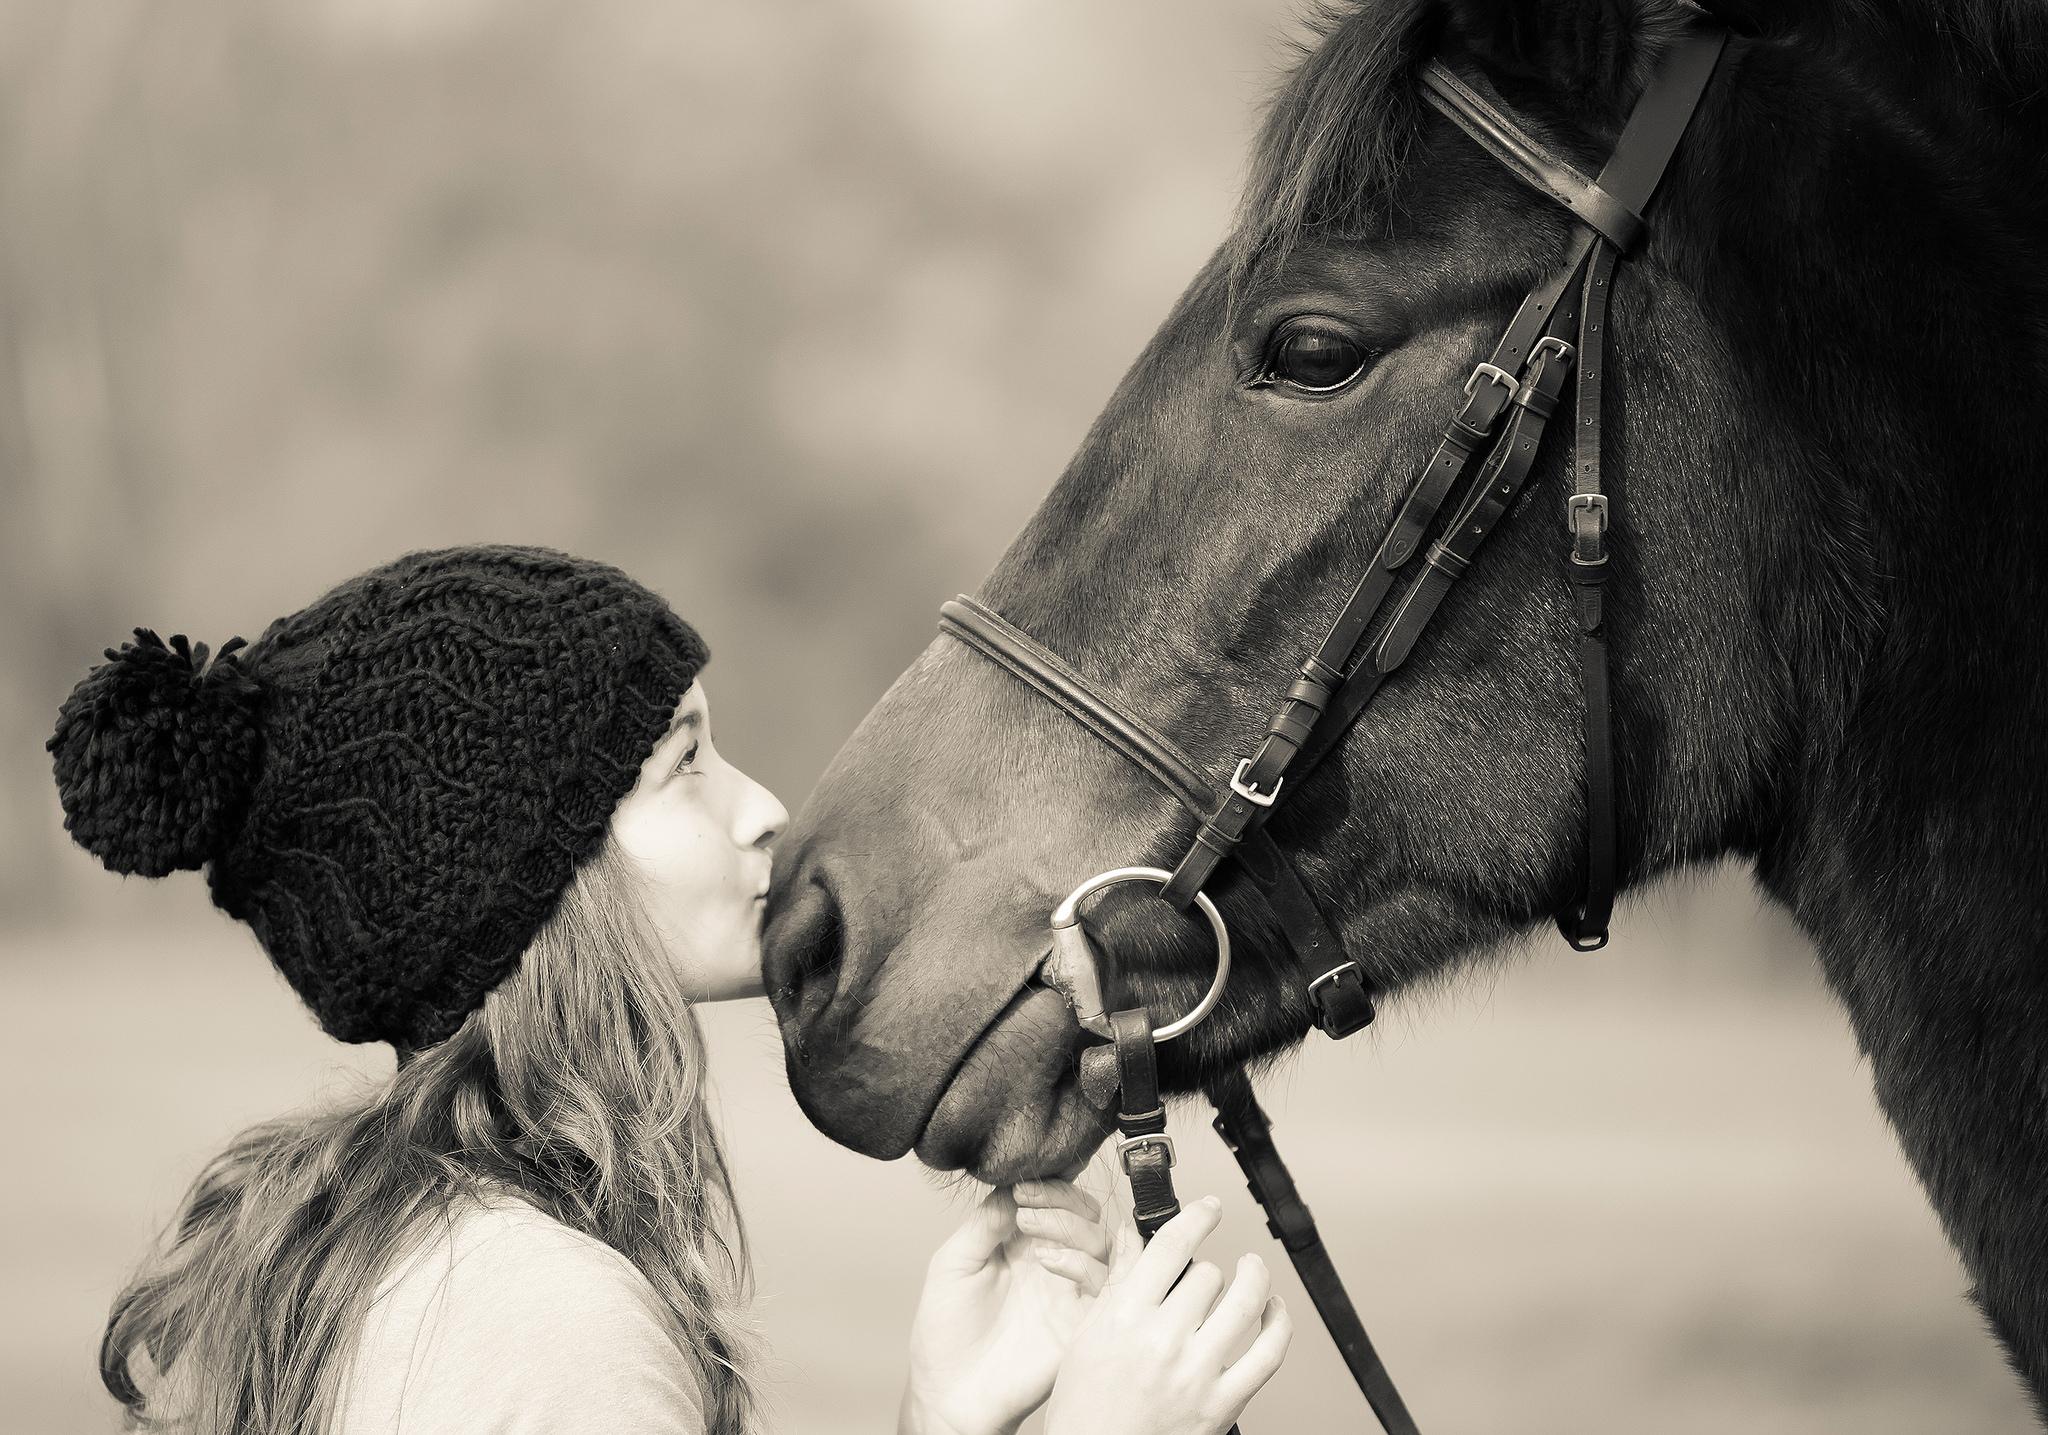 Mujer besando a caballo - 2048x1435